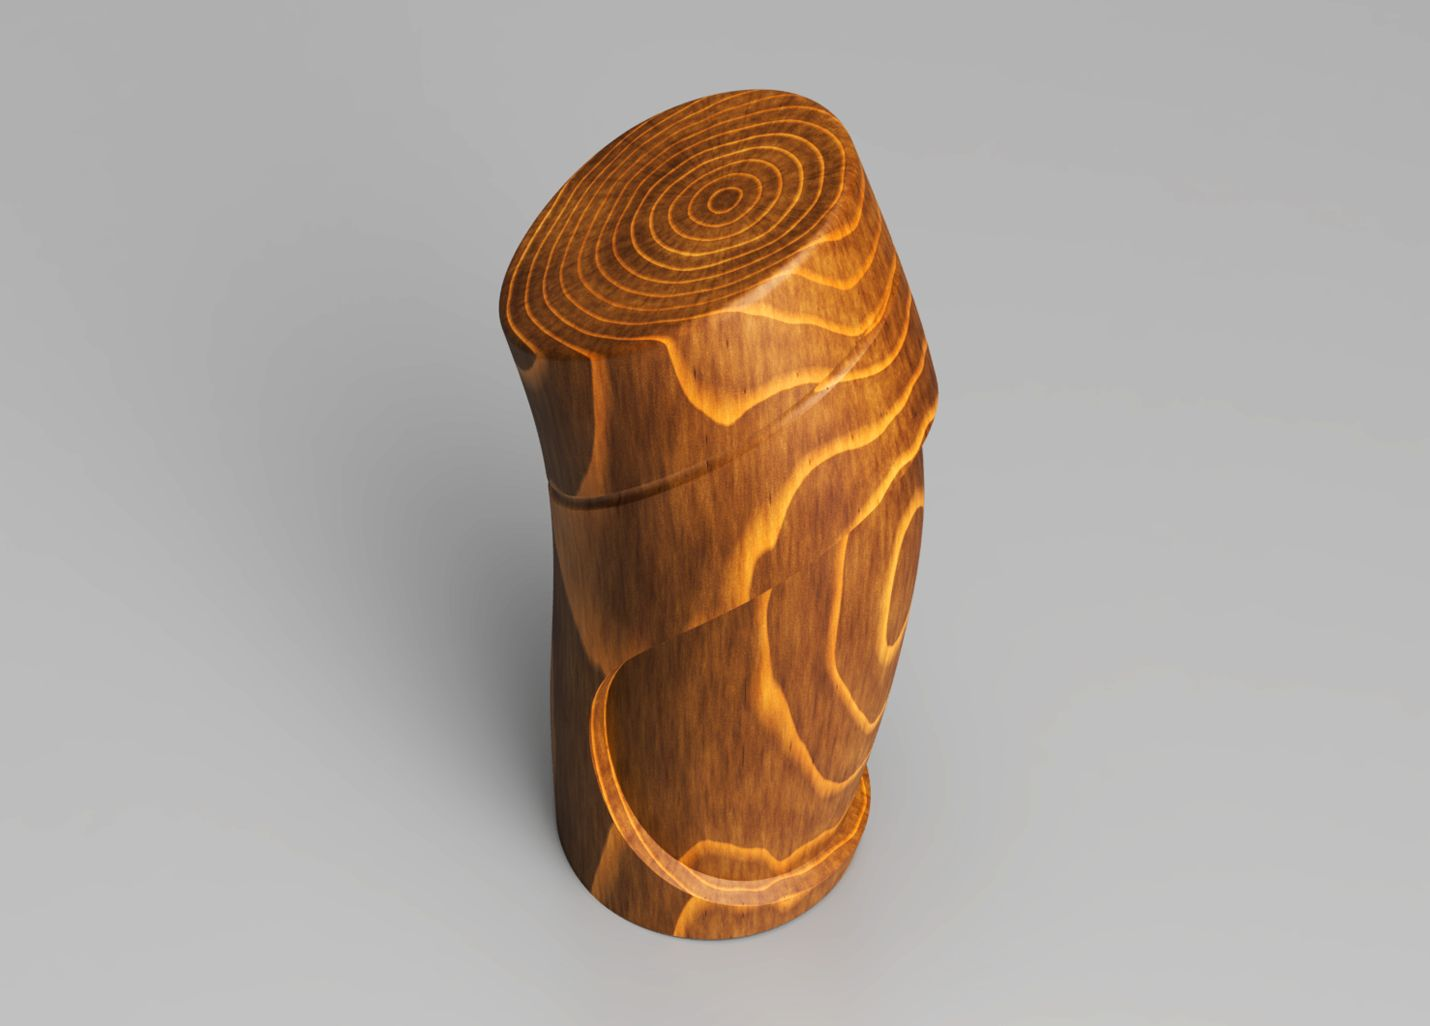 Art-stand-1-3500-3500